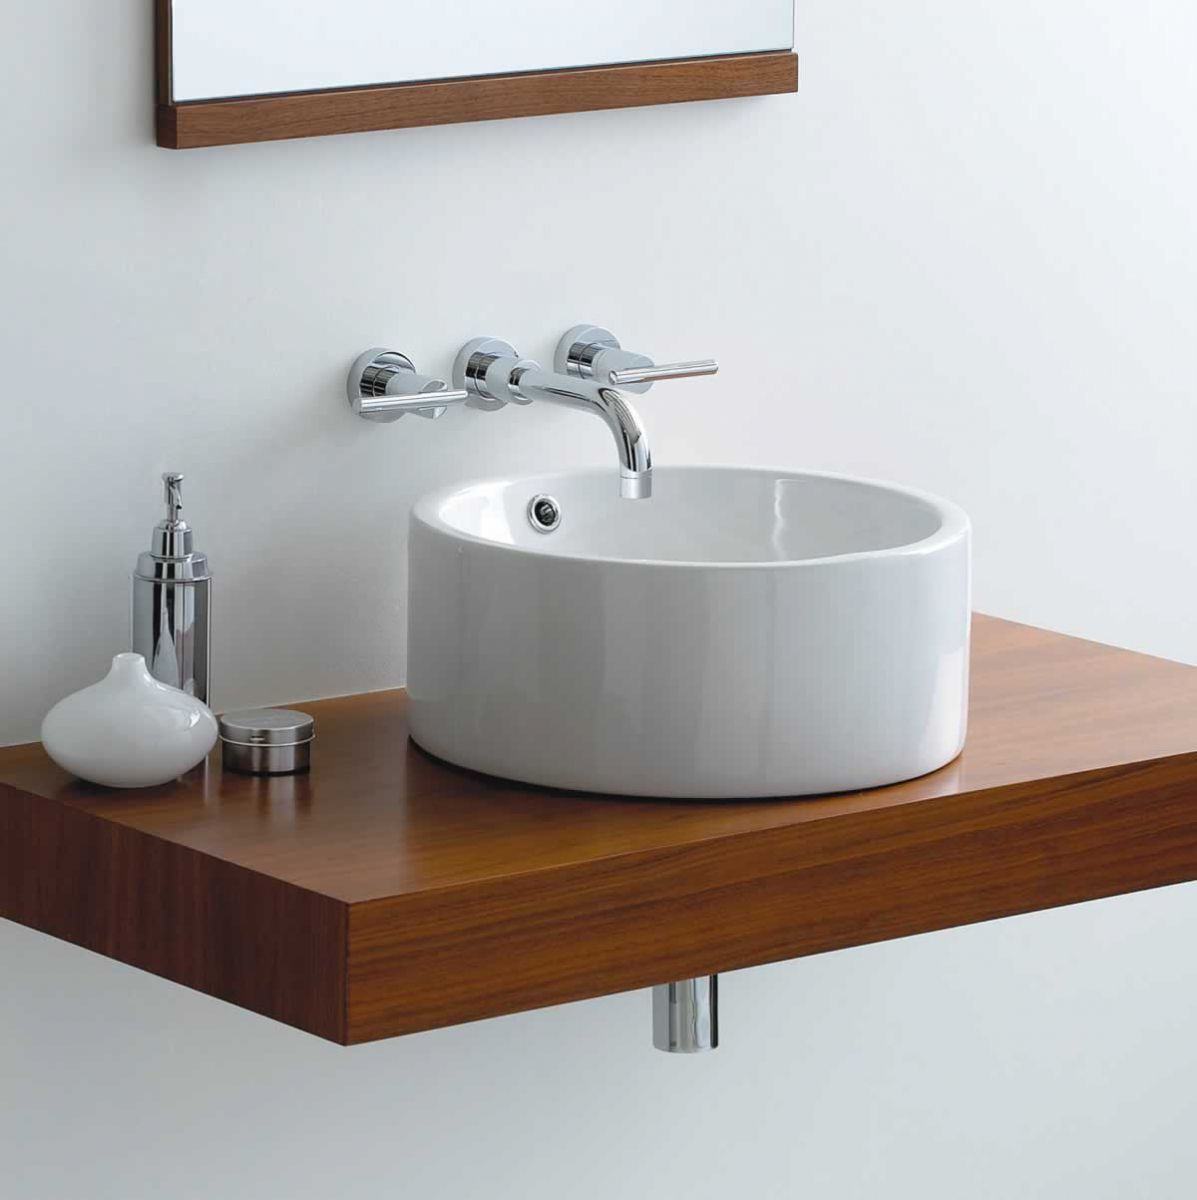 Sink Countertop Bathroom: Phoenix Susan Circular Counter Top Basin VB003. From Www